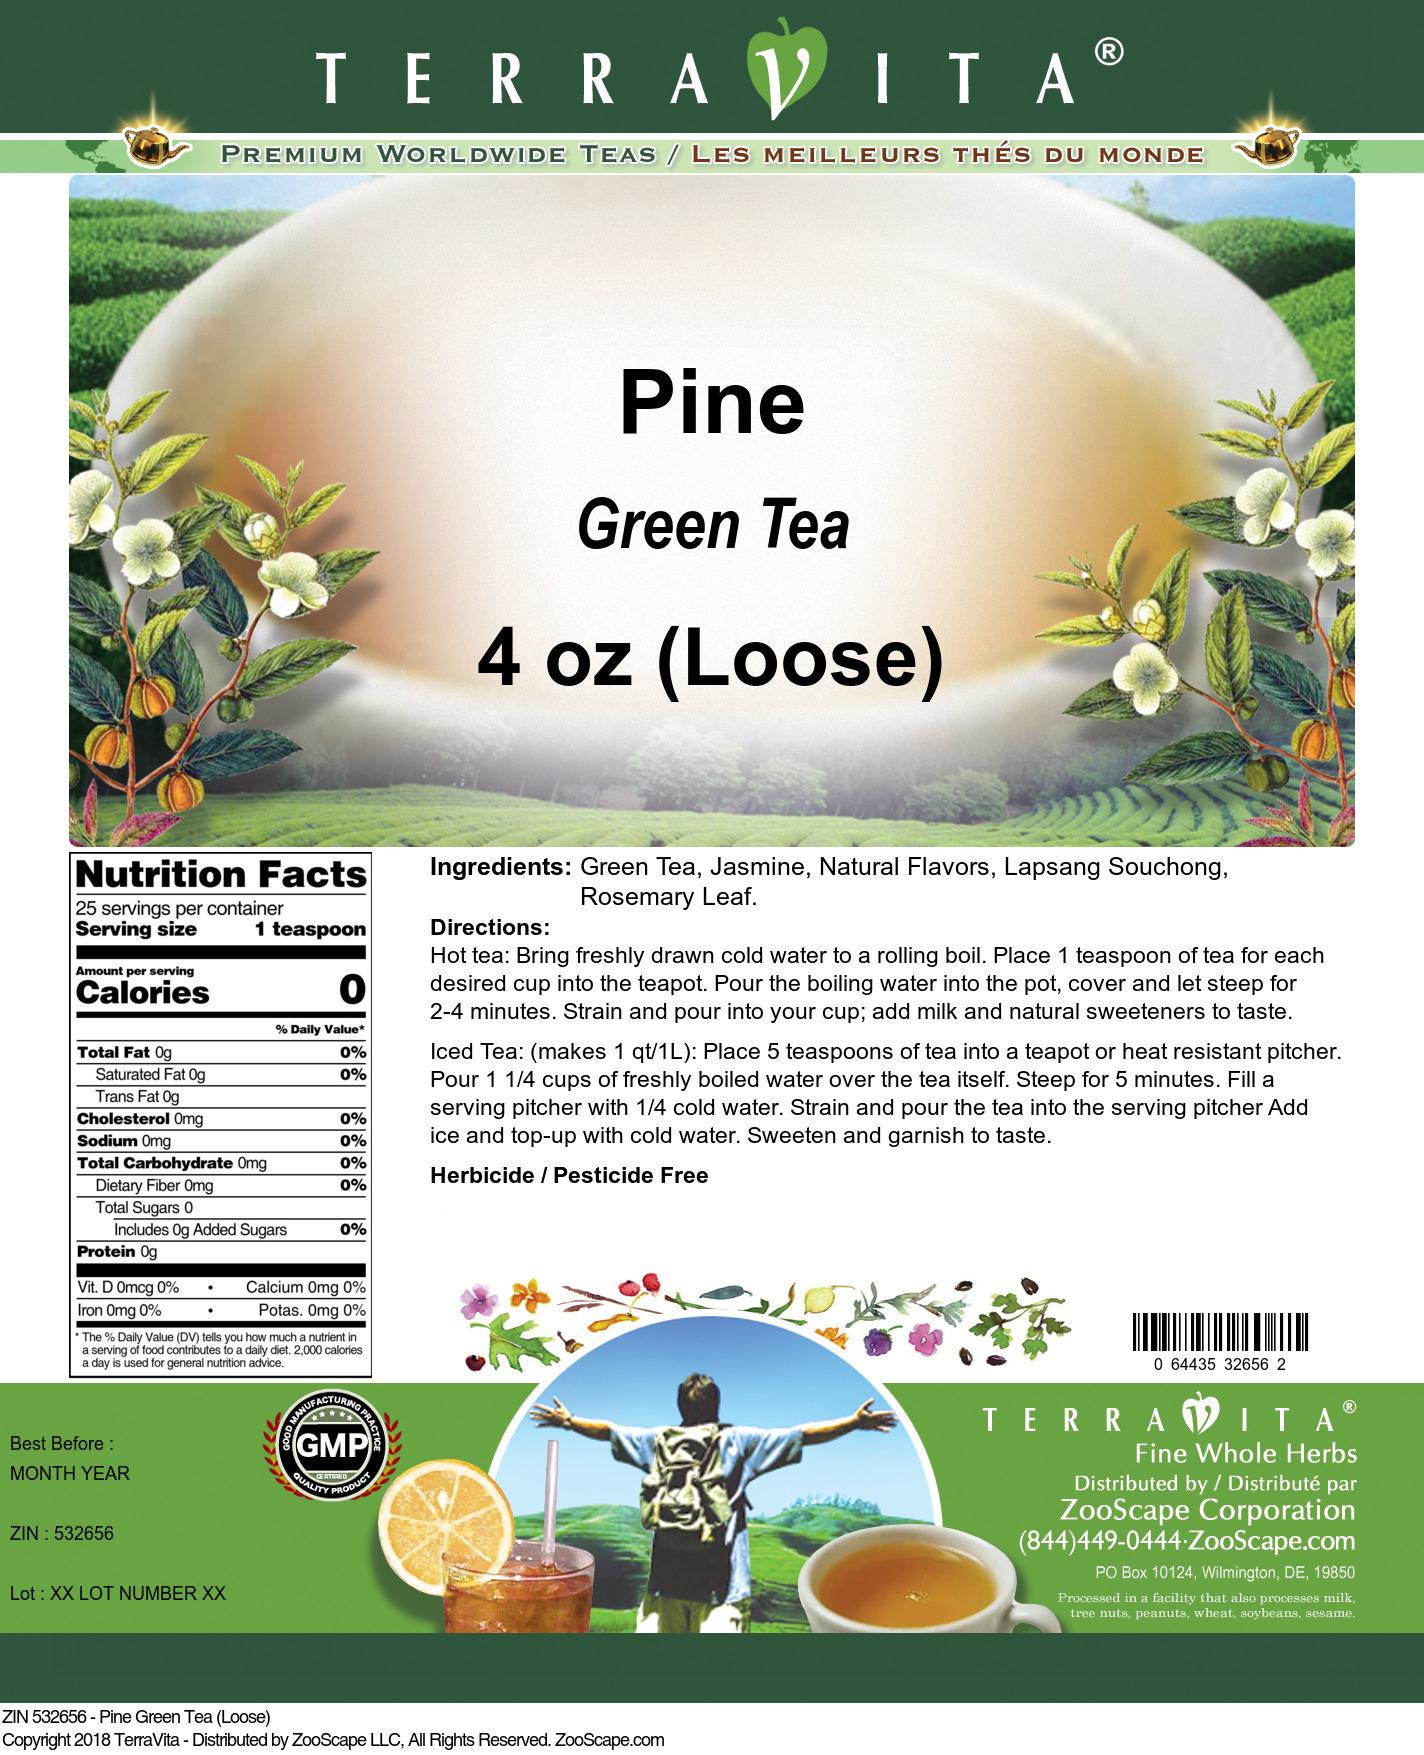 Pine Green Tea